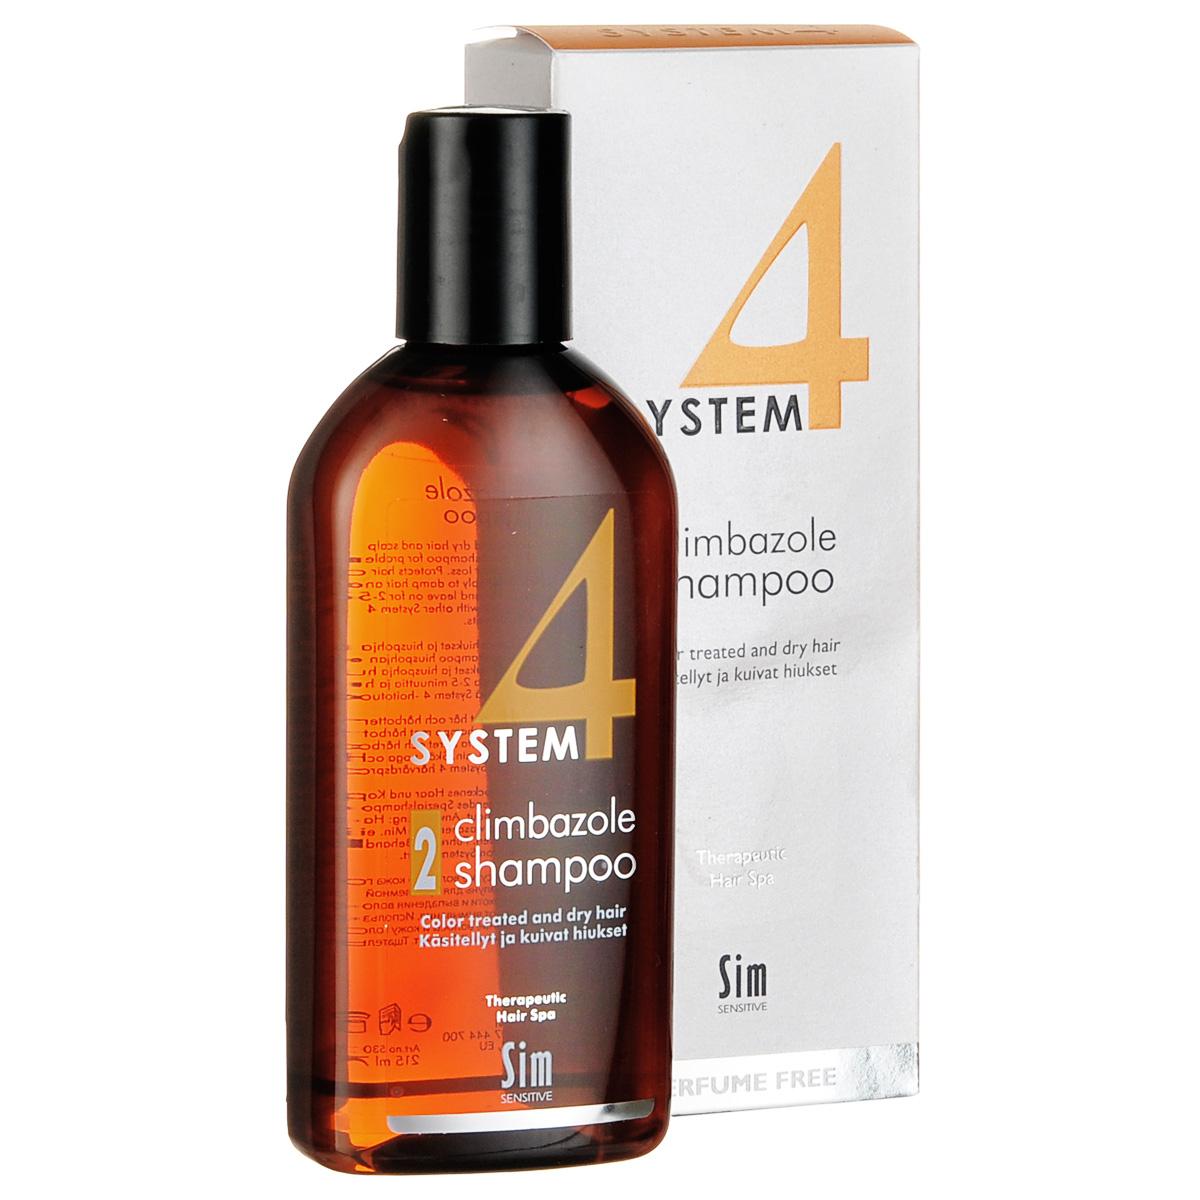 SIM SENSITIVE Терапевтический шампунь № 2 SYSTEM 4 Climbazole Shampoo 2 , 215 мл